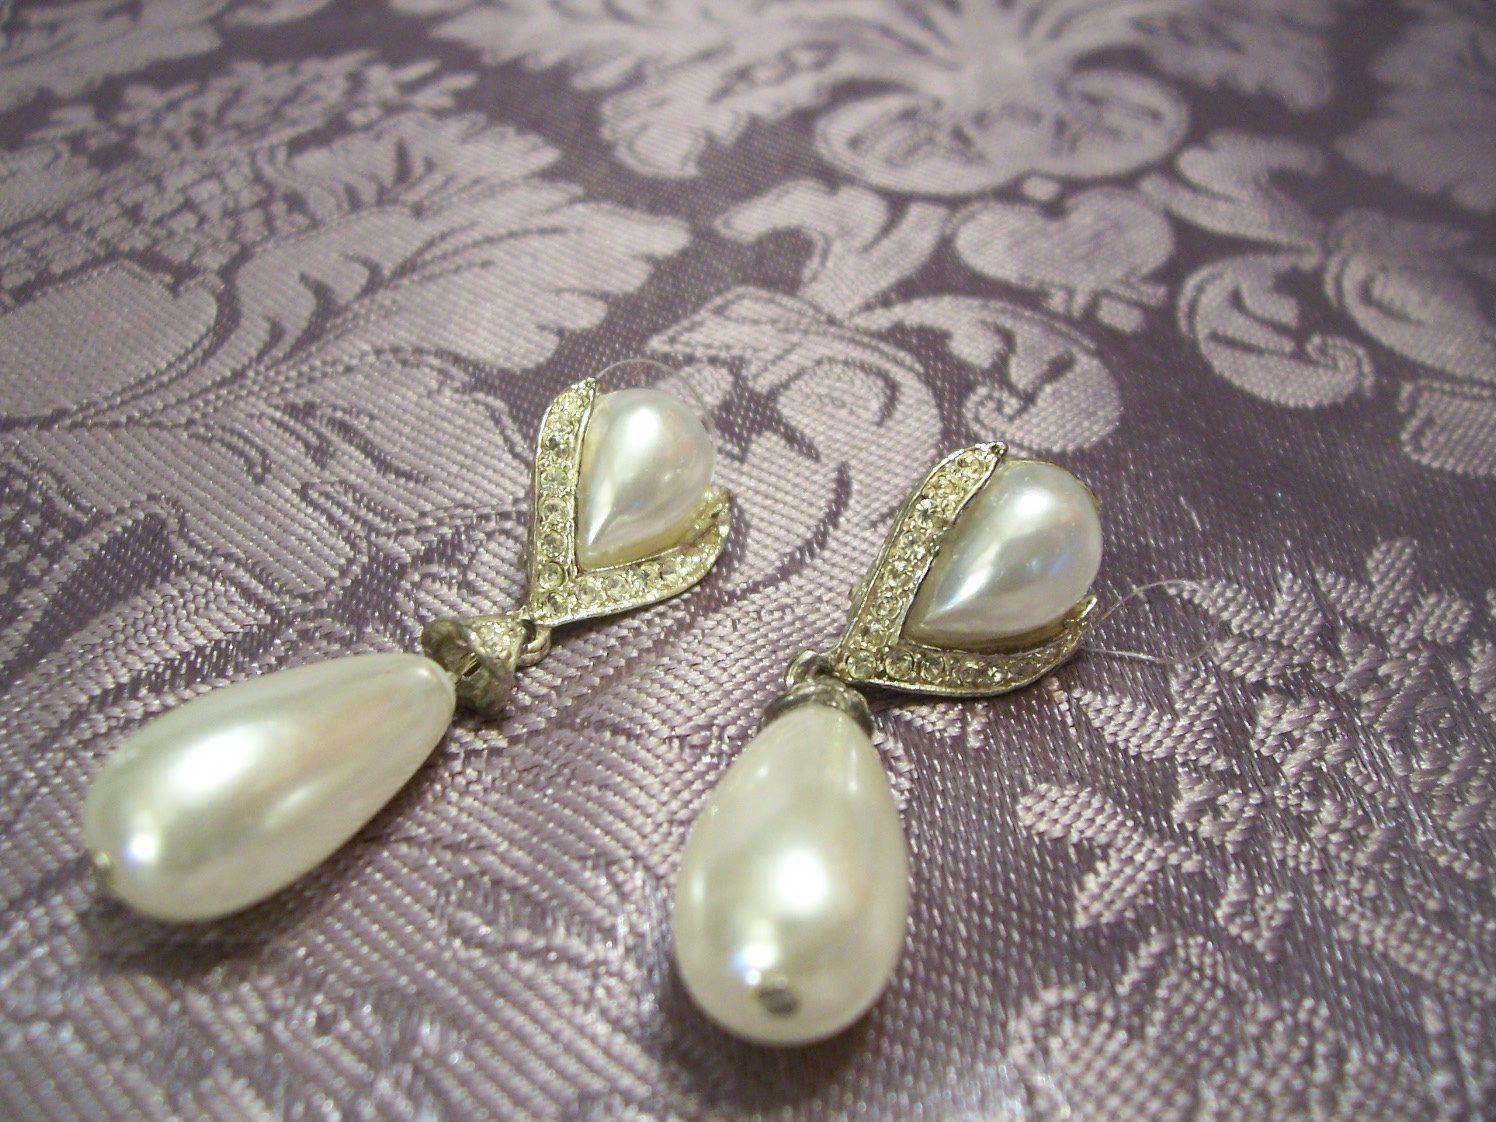 Elegant  Avenue, Earrings, Tear Drop, Faux Pearls, Austrian Crystals, Silver White, Pearls Dangle, Wedding Brides, Mother Bridal, Formal,